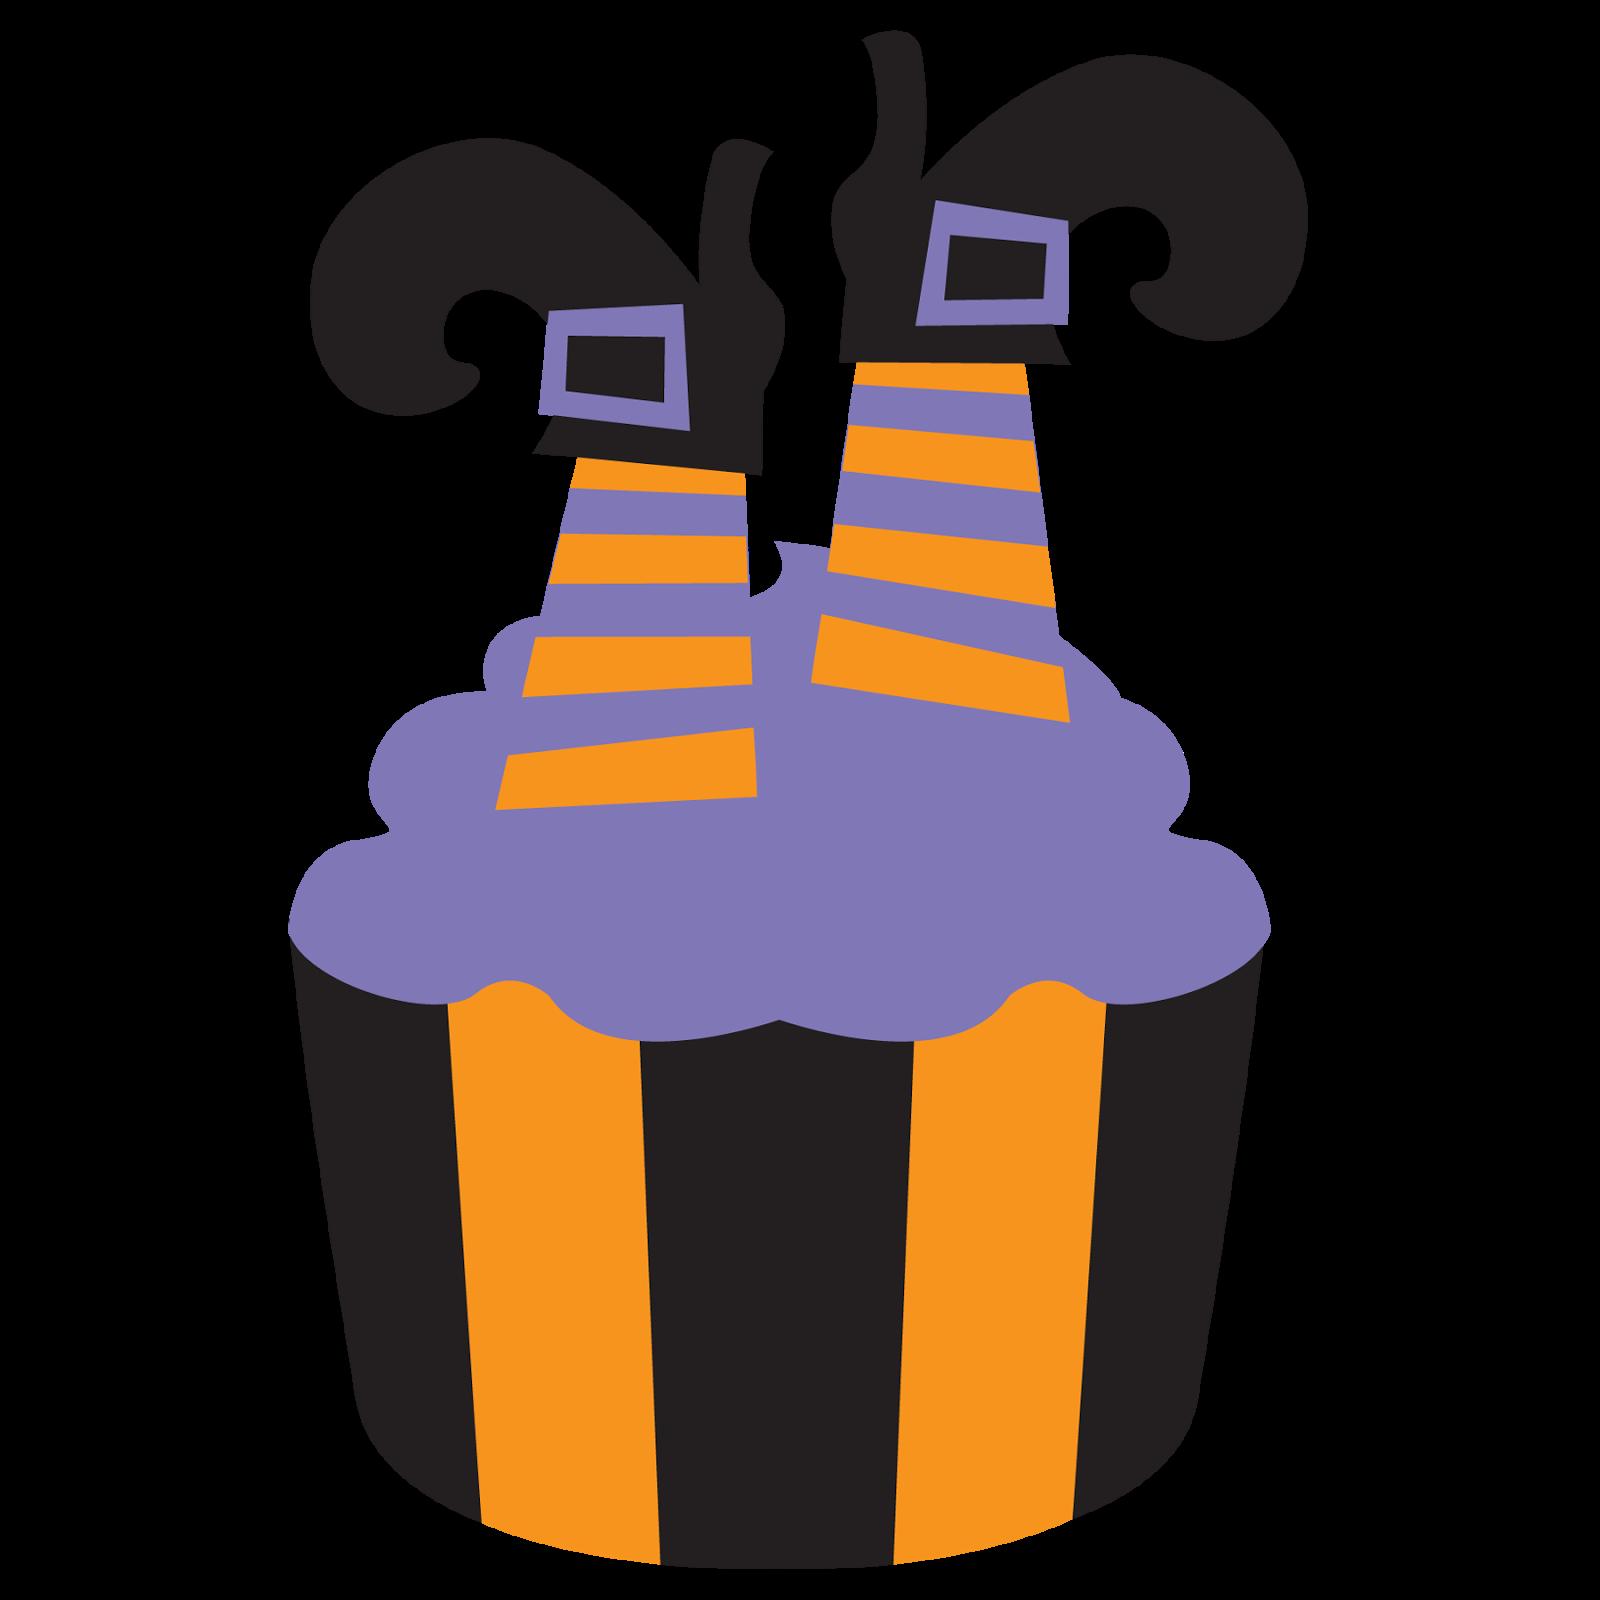 Cute halloween cupcake clipart banner Wonderdigi - Sandra Jones Illustration & Clipart: October 2014 banner